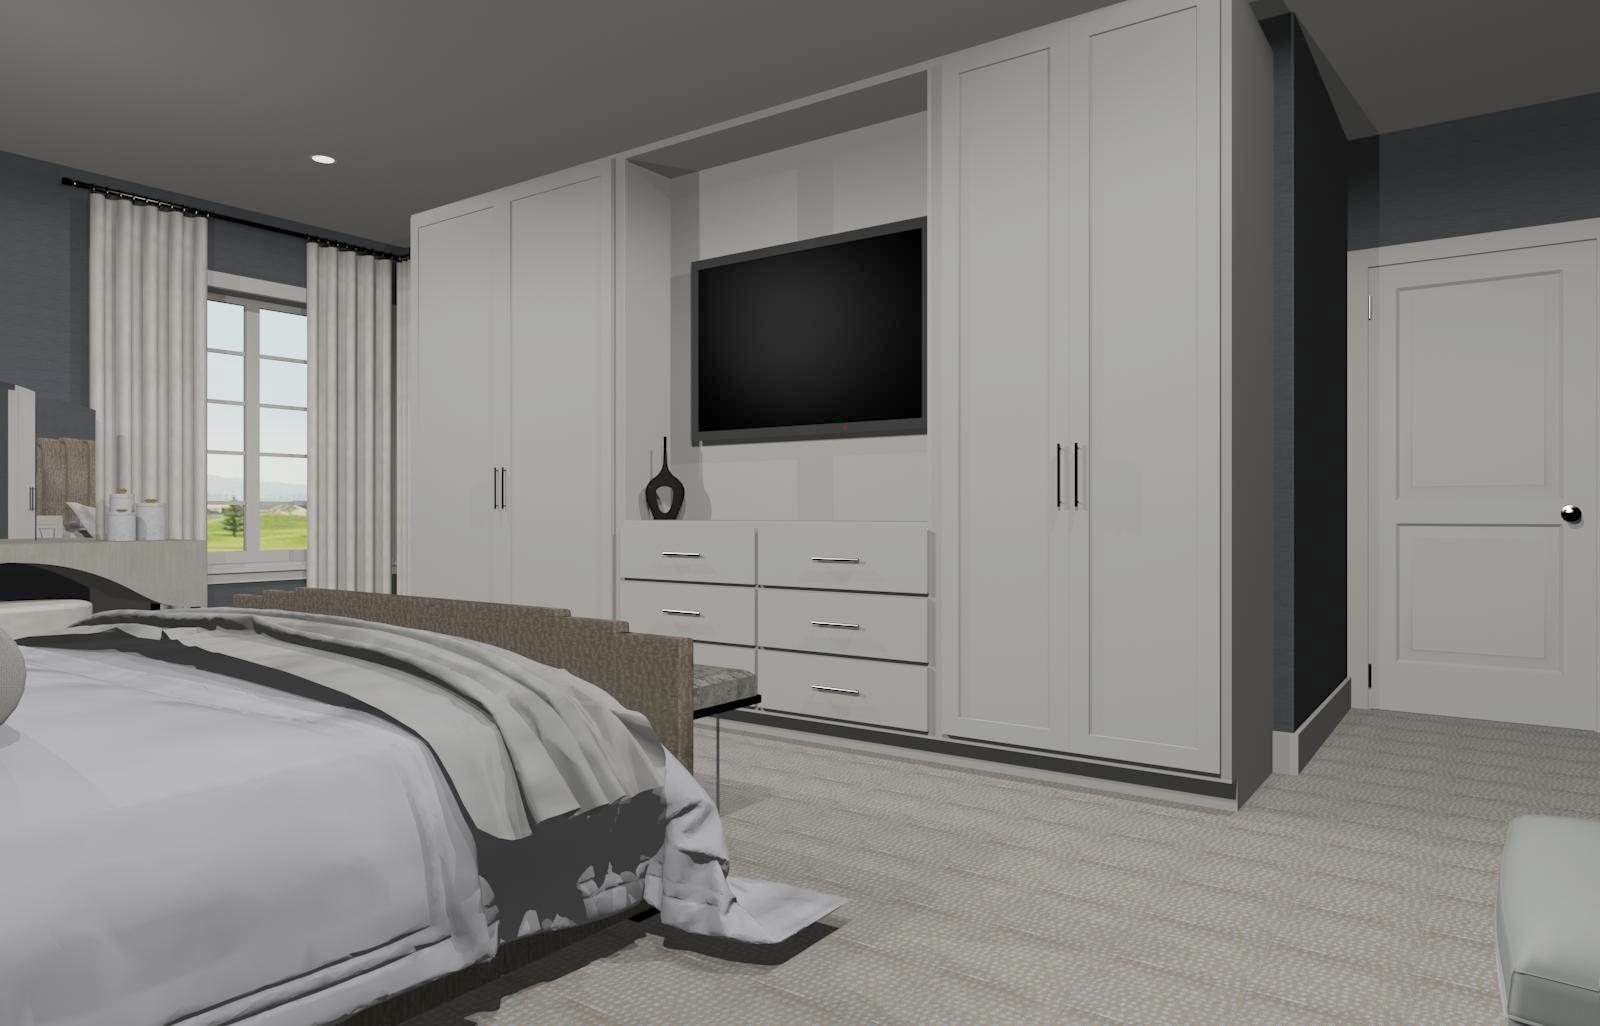 Bedroom-2-Final-1.jpeg